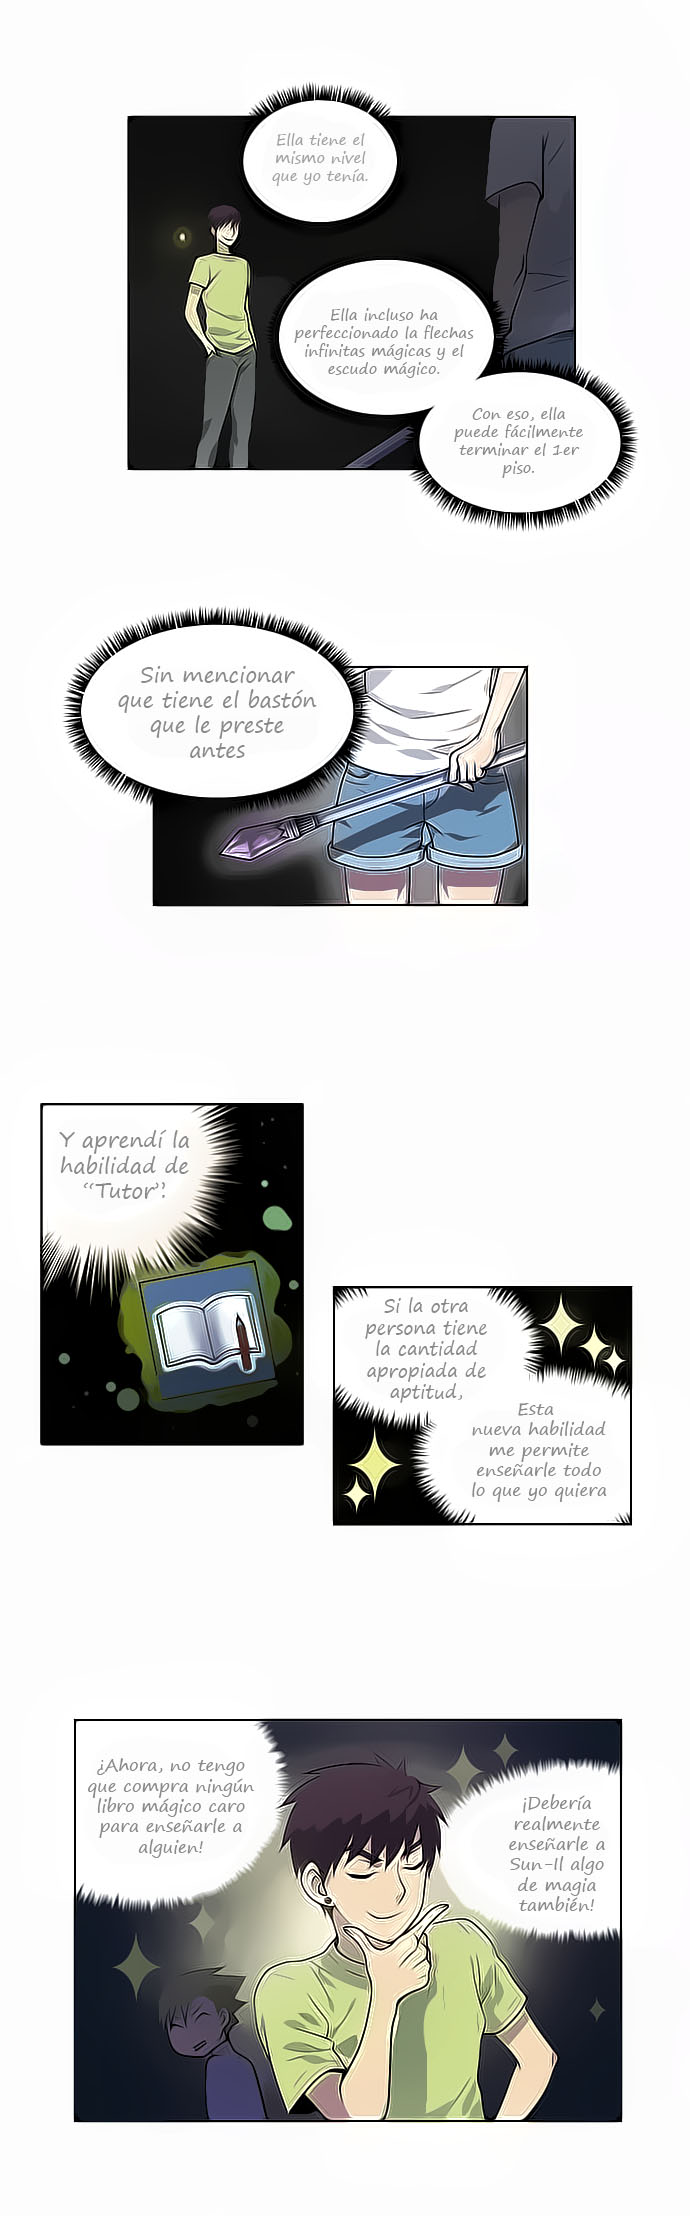 http://c5.ninemanga.com/es_manga/61/1725/434275/ba3c23643e63d3609b65864a227b14dd.jpg Page 16